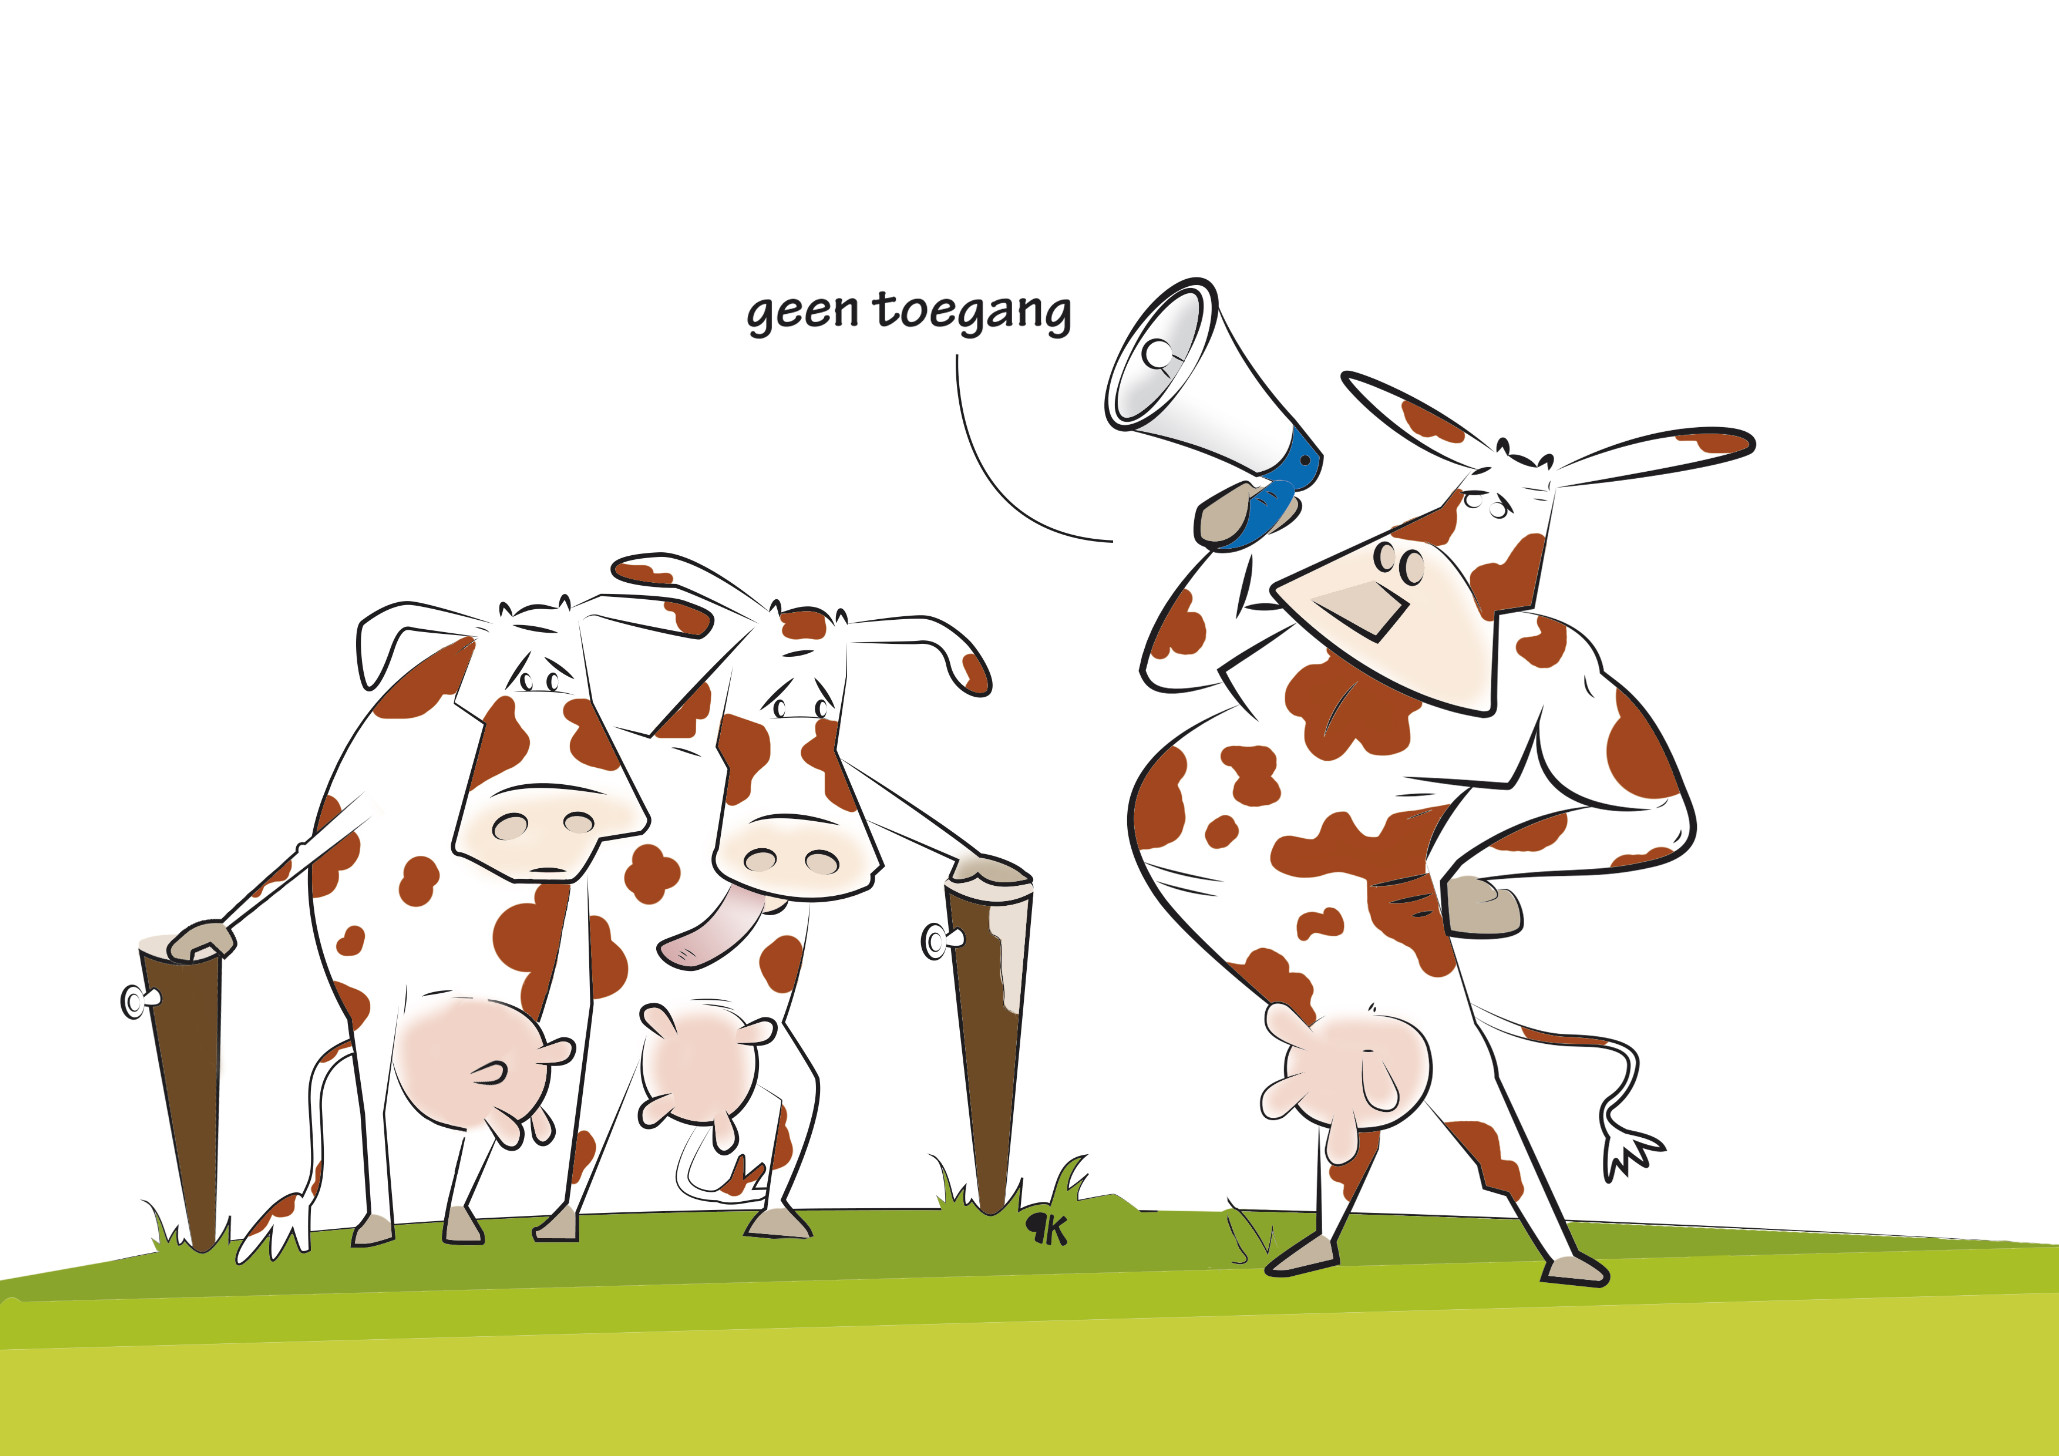 Mestgas wordt twee koeien fataal